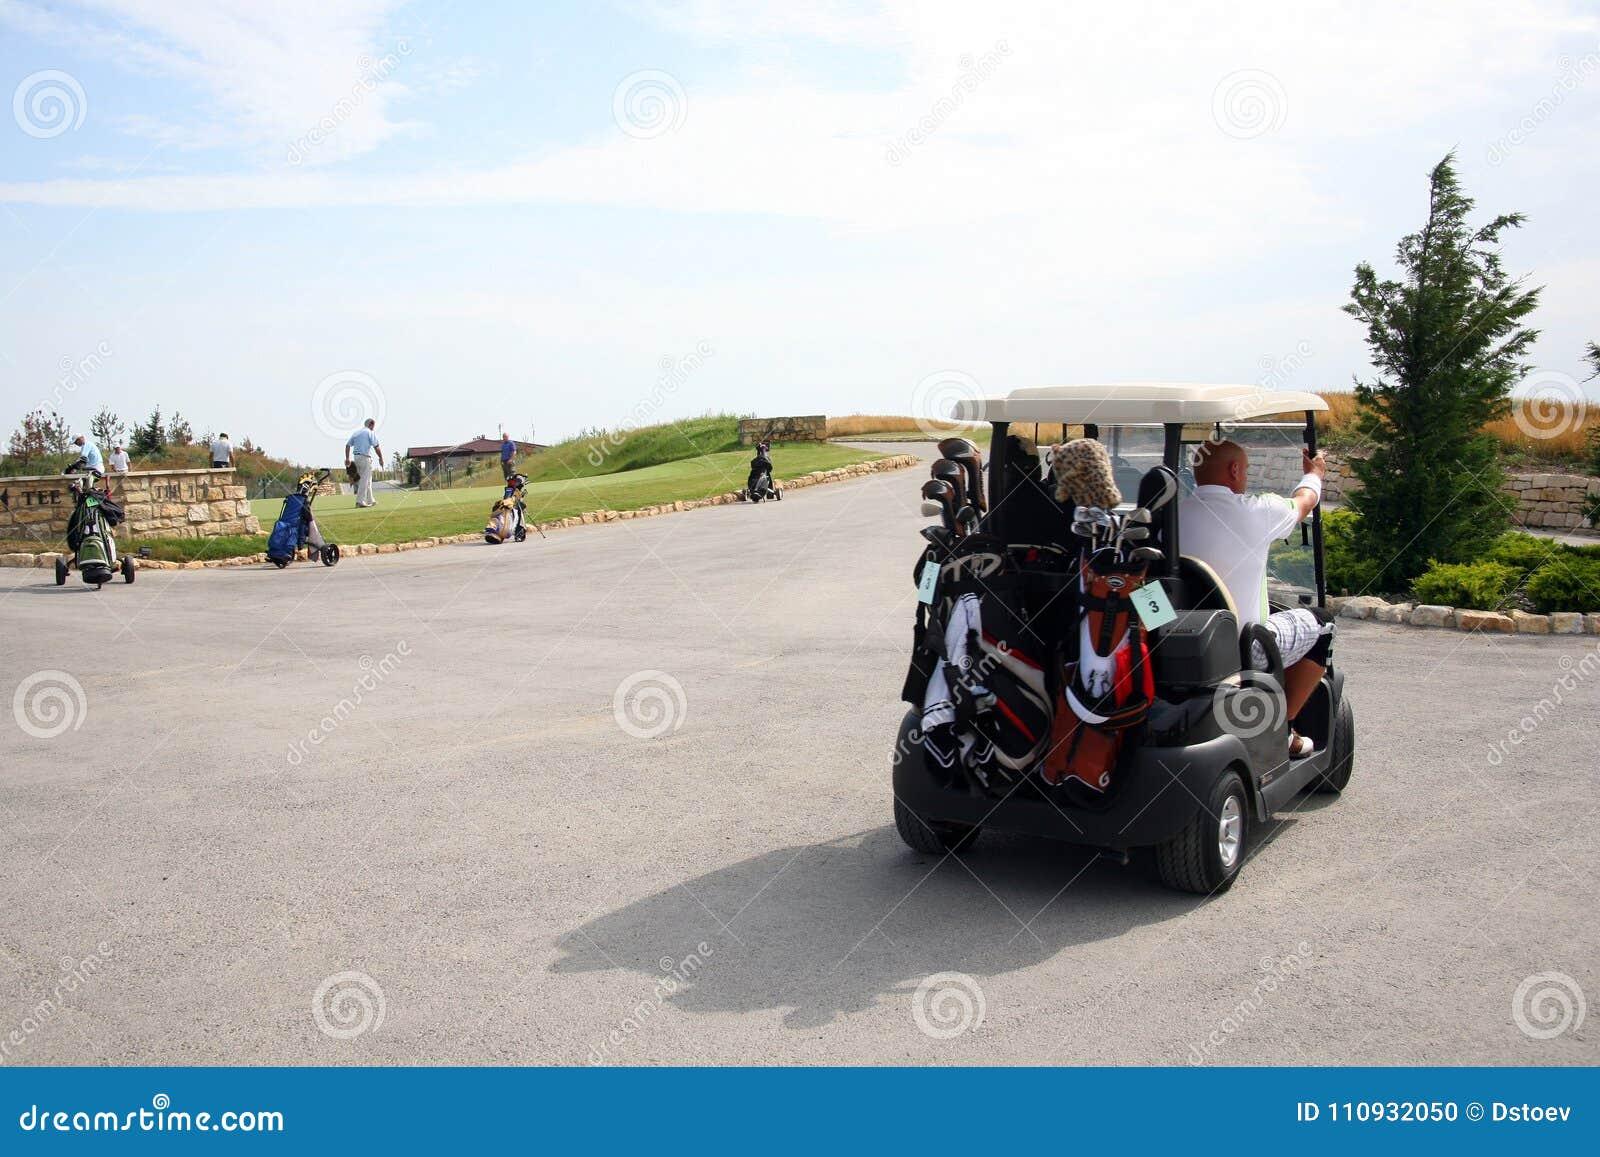 Tournament Golf Cart on golf pull carts walmart, golf tournament invitations, golf tournament sponsorship,